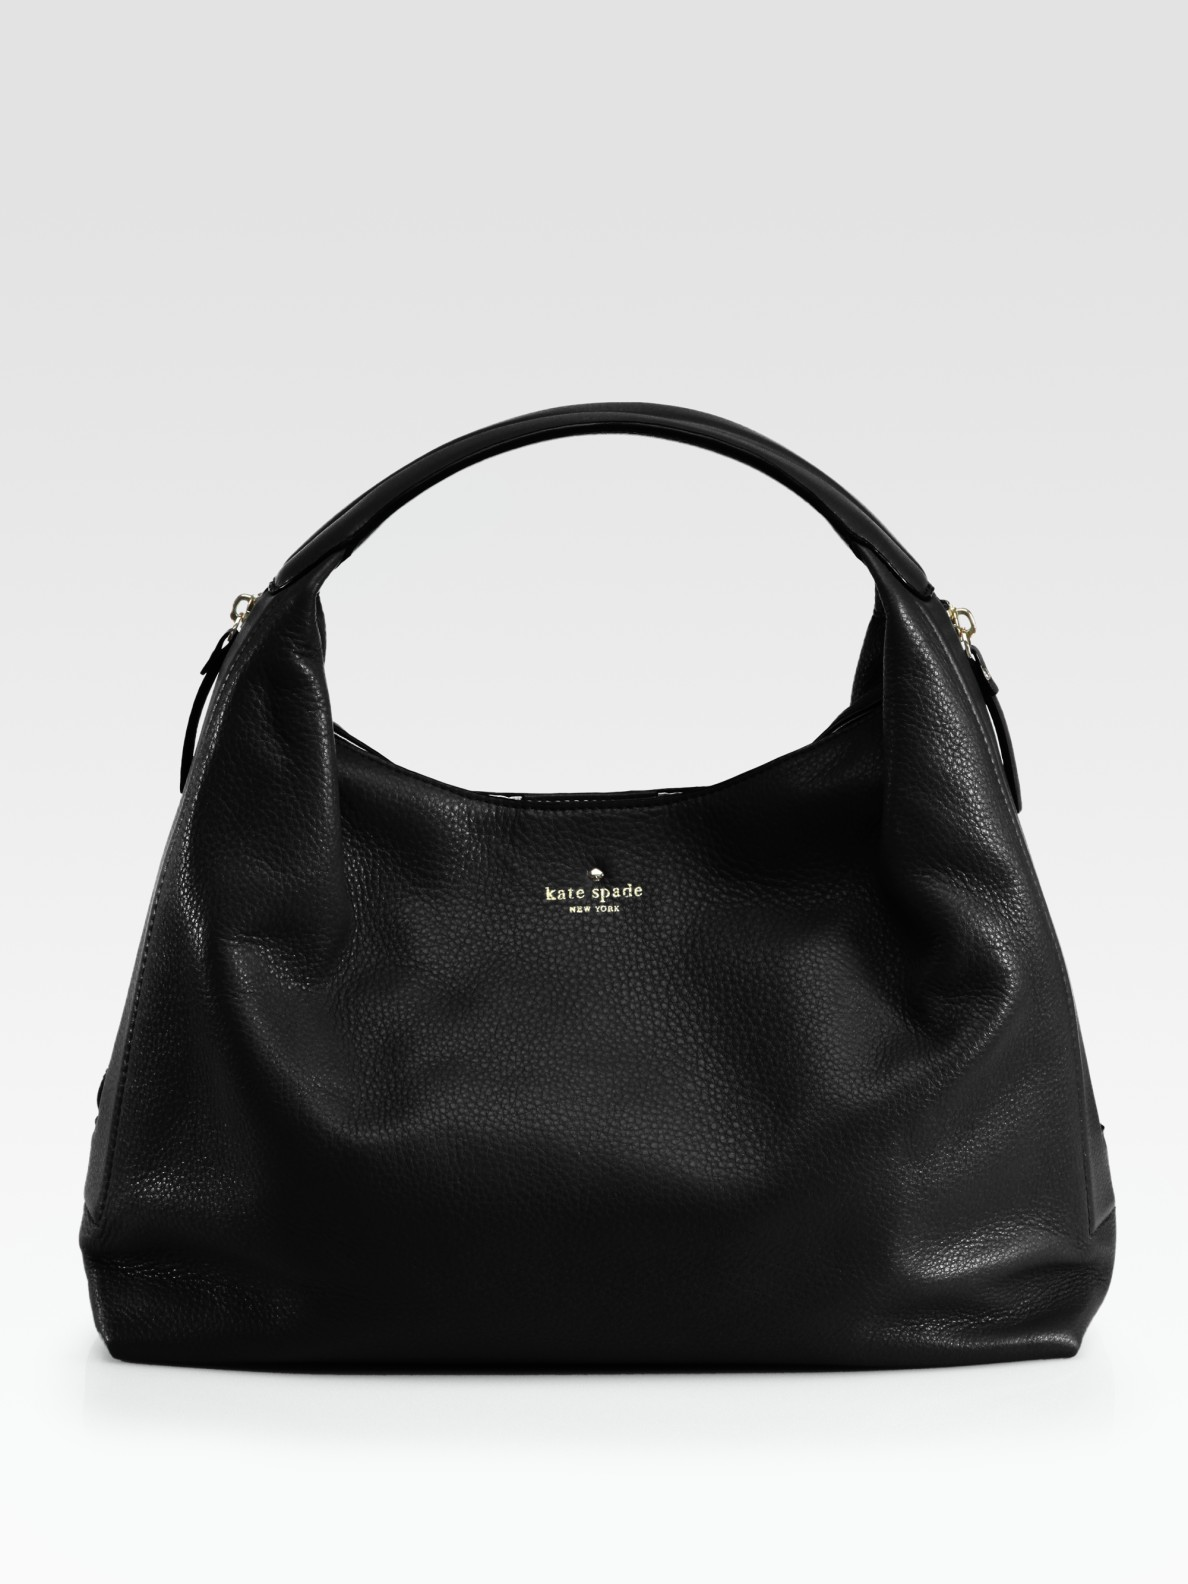 Lyst Kate Spade New York Juniper Hobo Bag In Black